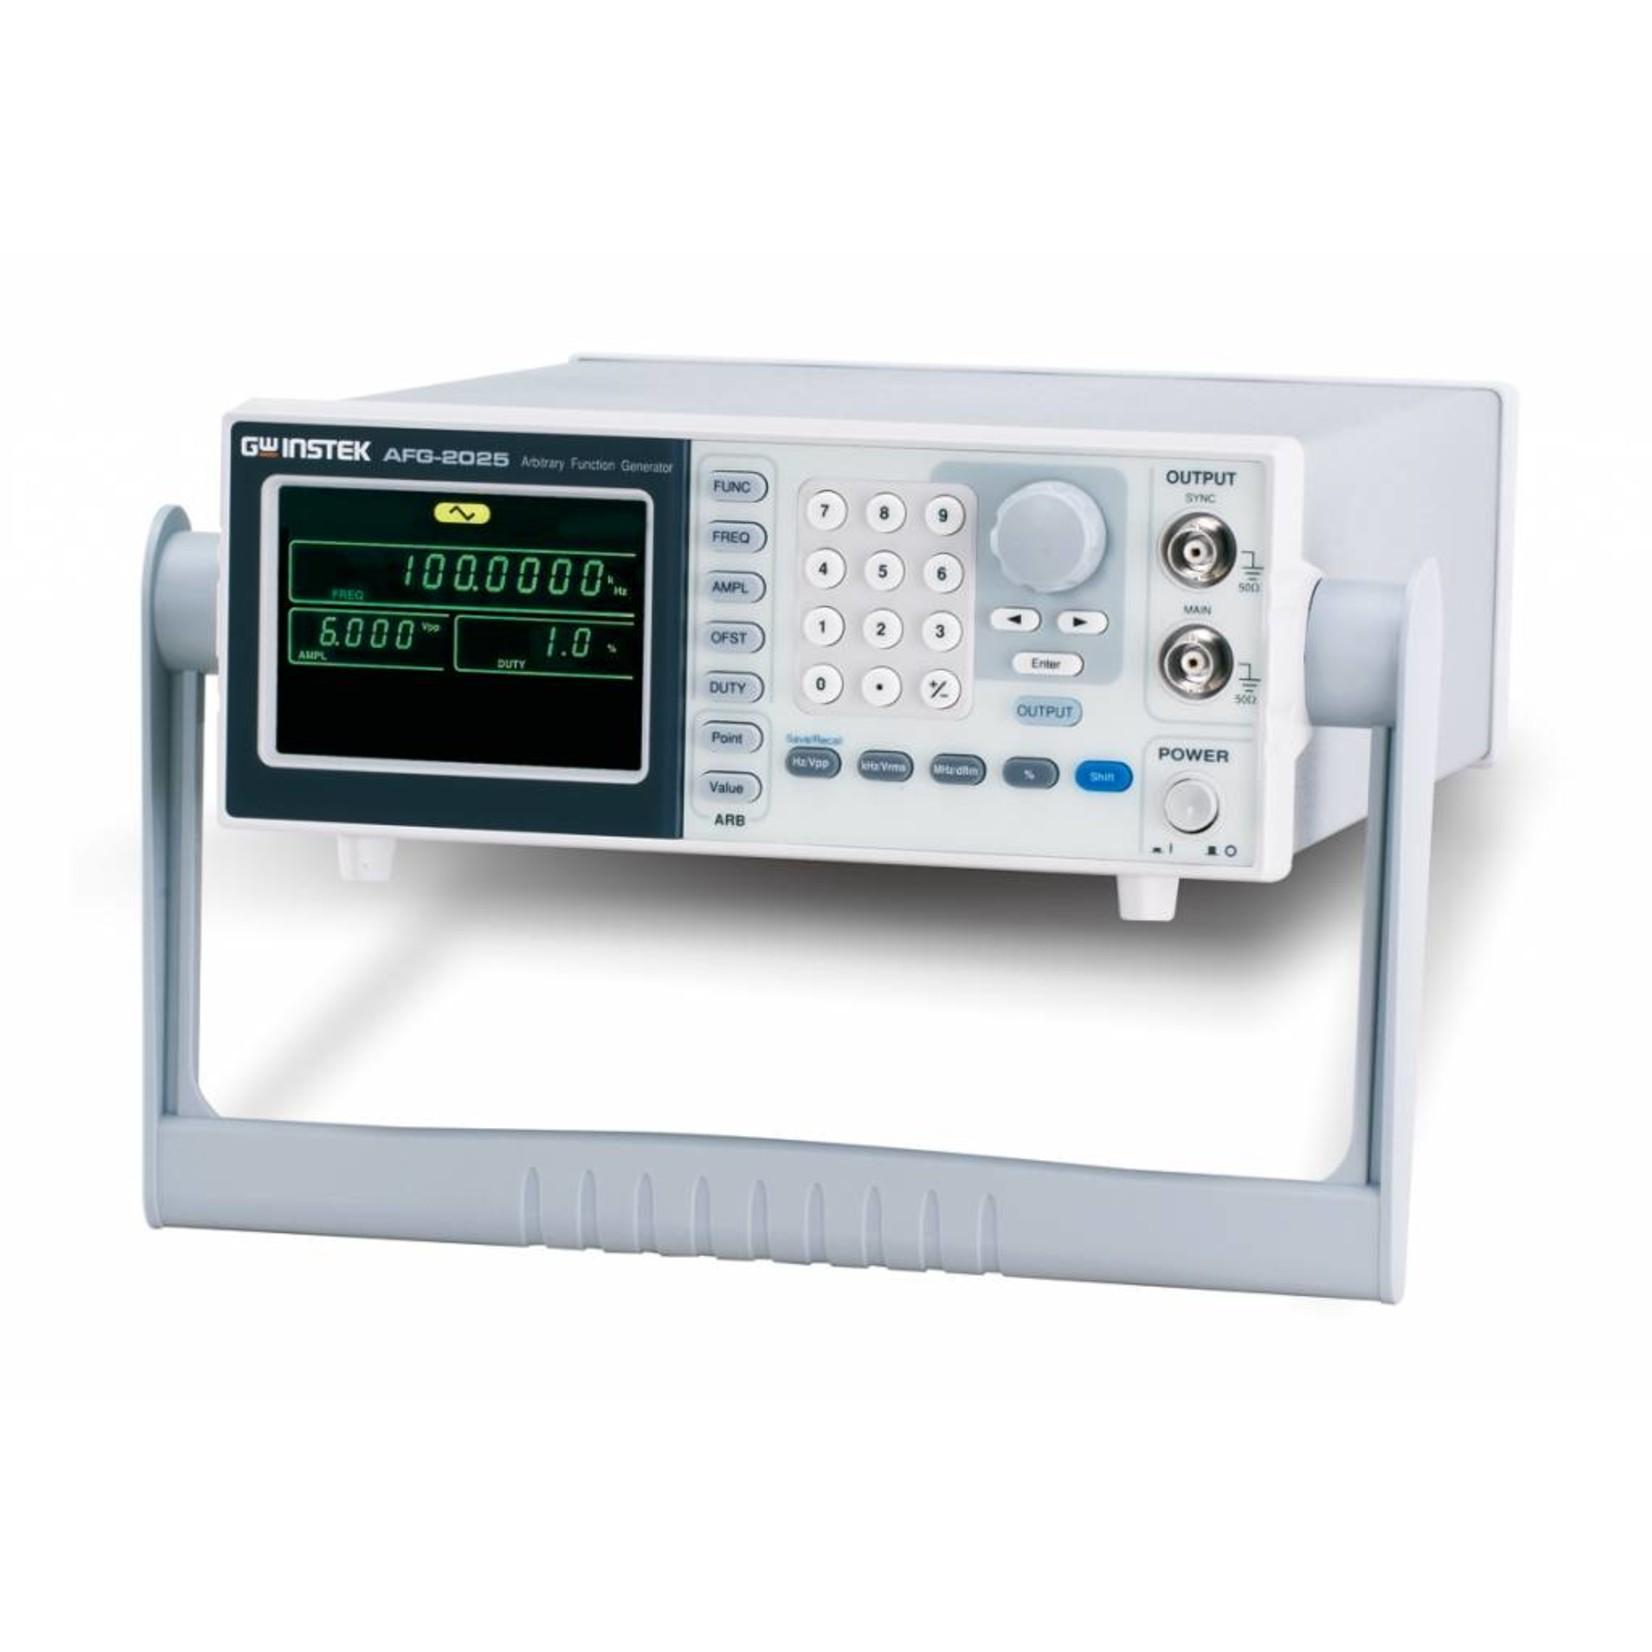 GW INSTEK 5 MHz Arbitrary Waveform Functie Generator